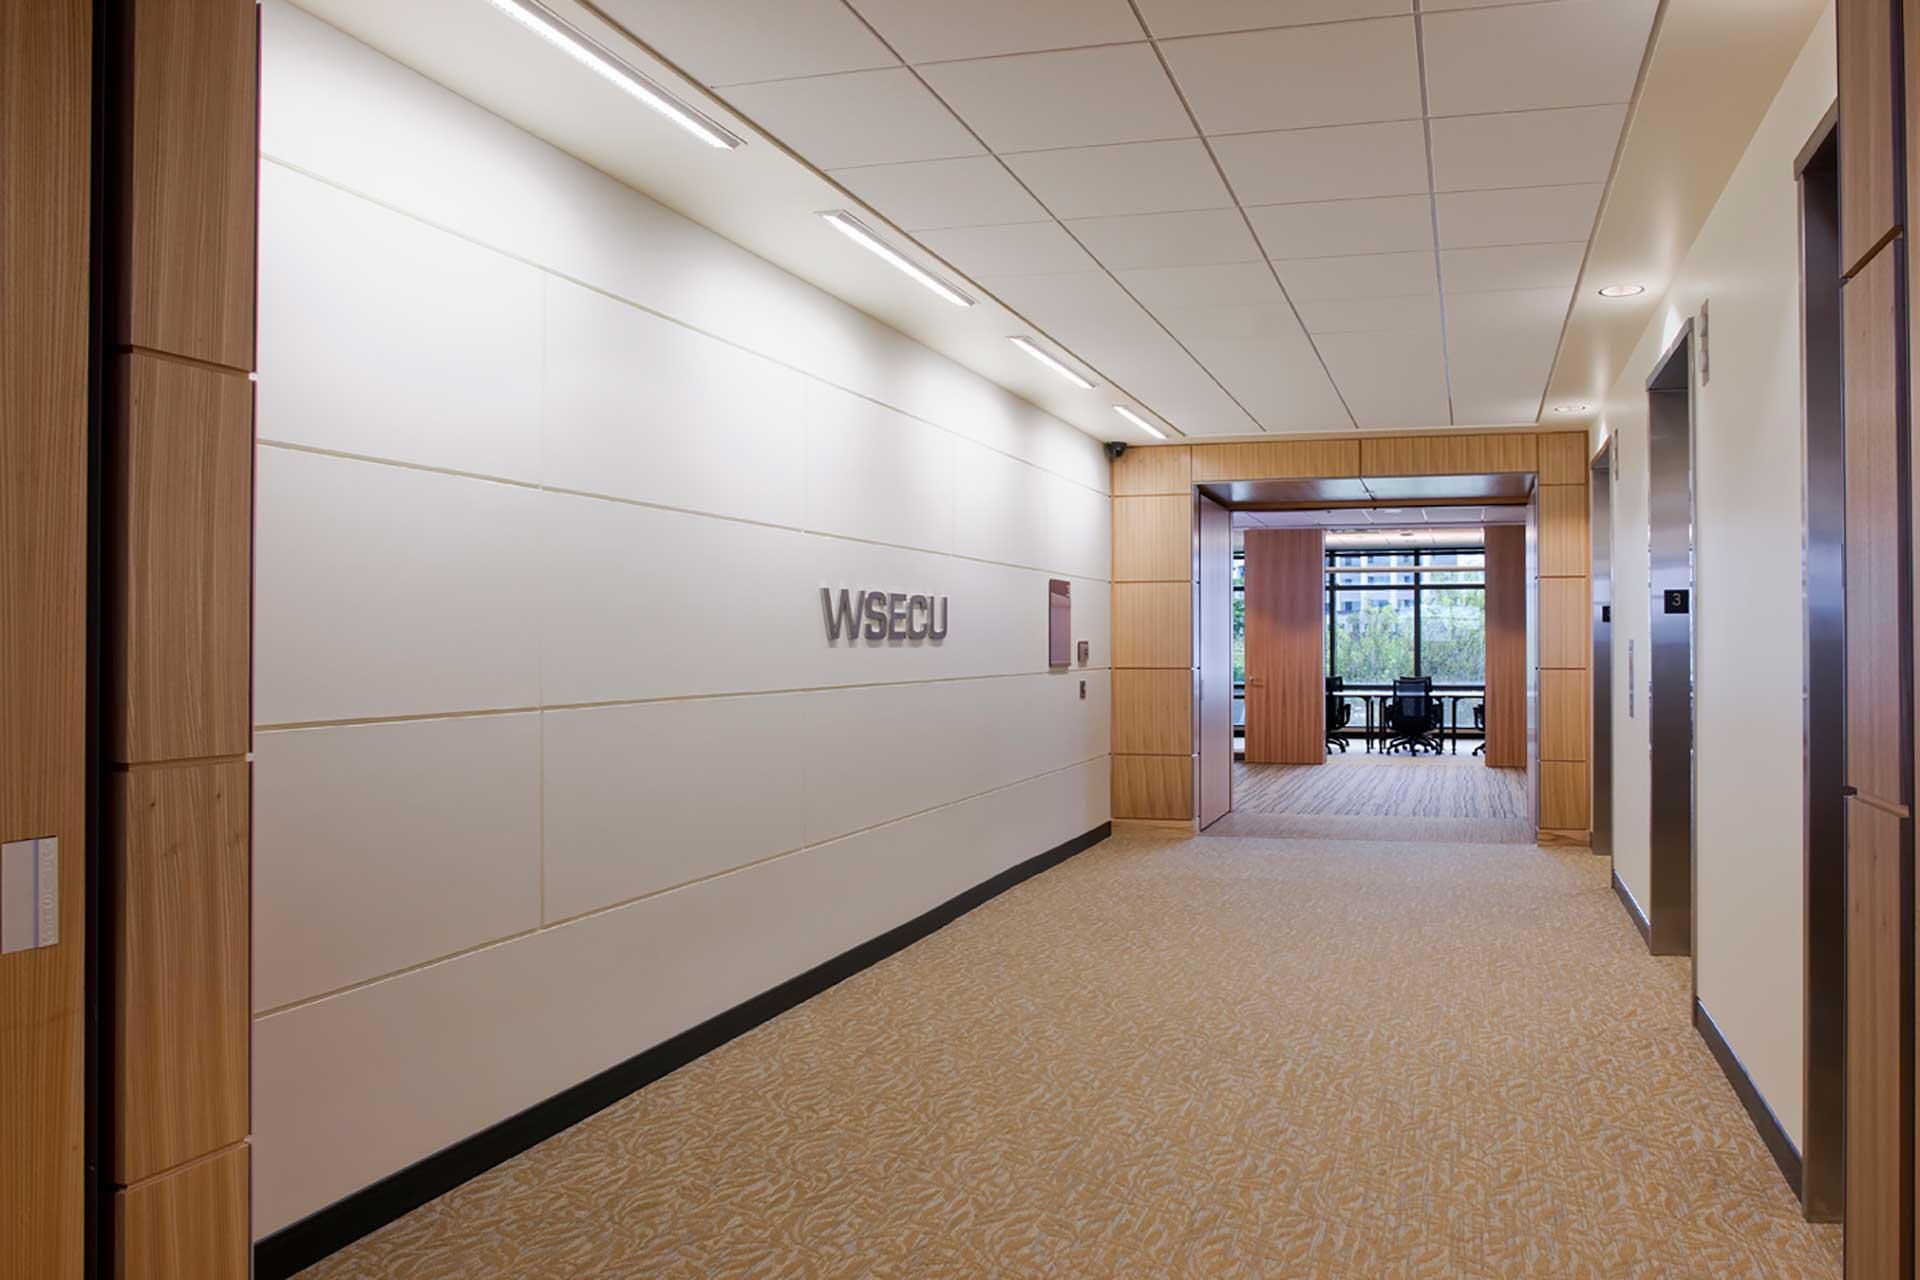 https://www.goudycc.com/wp-content/uploads/2020/12/wsecu-headquarters-8.jpg